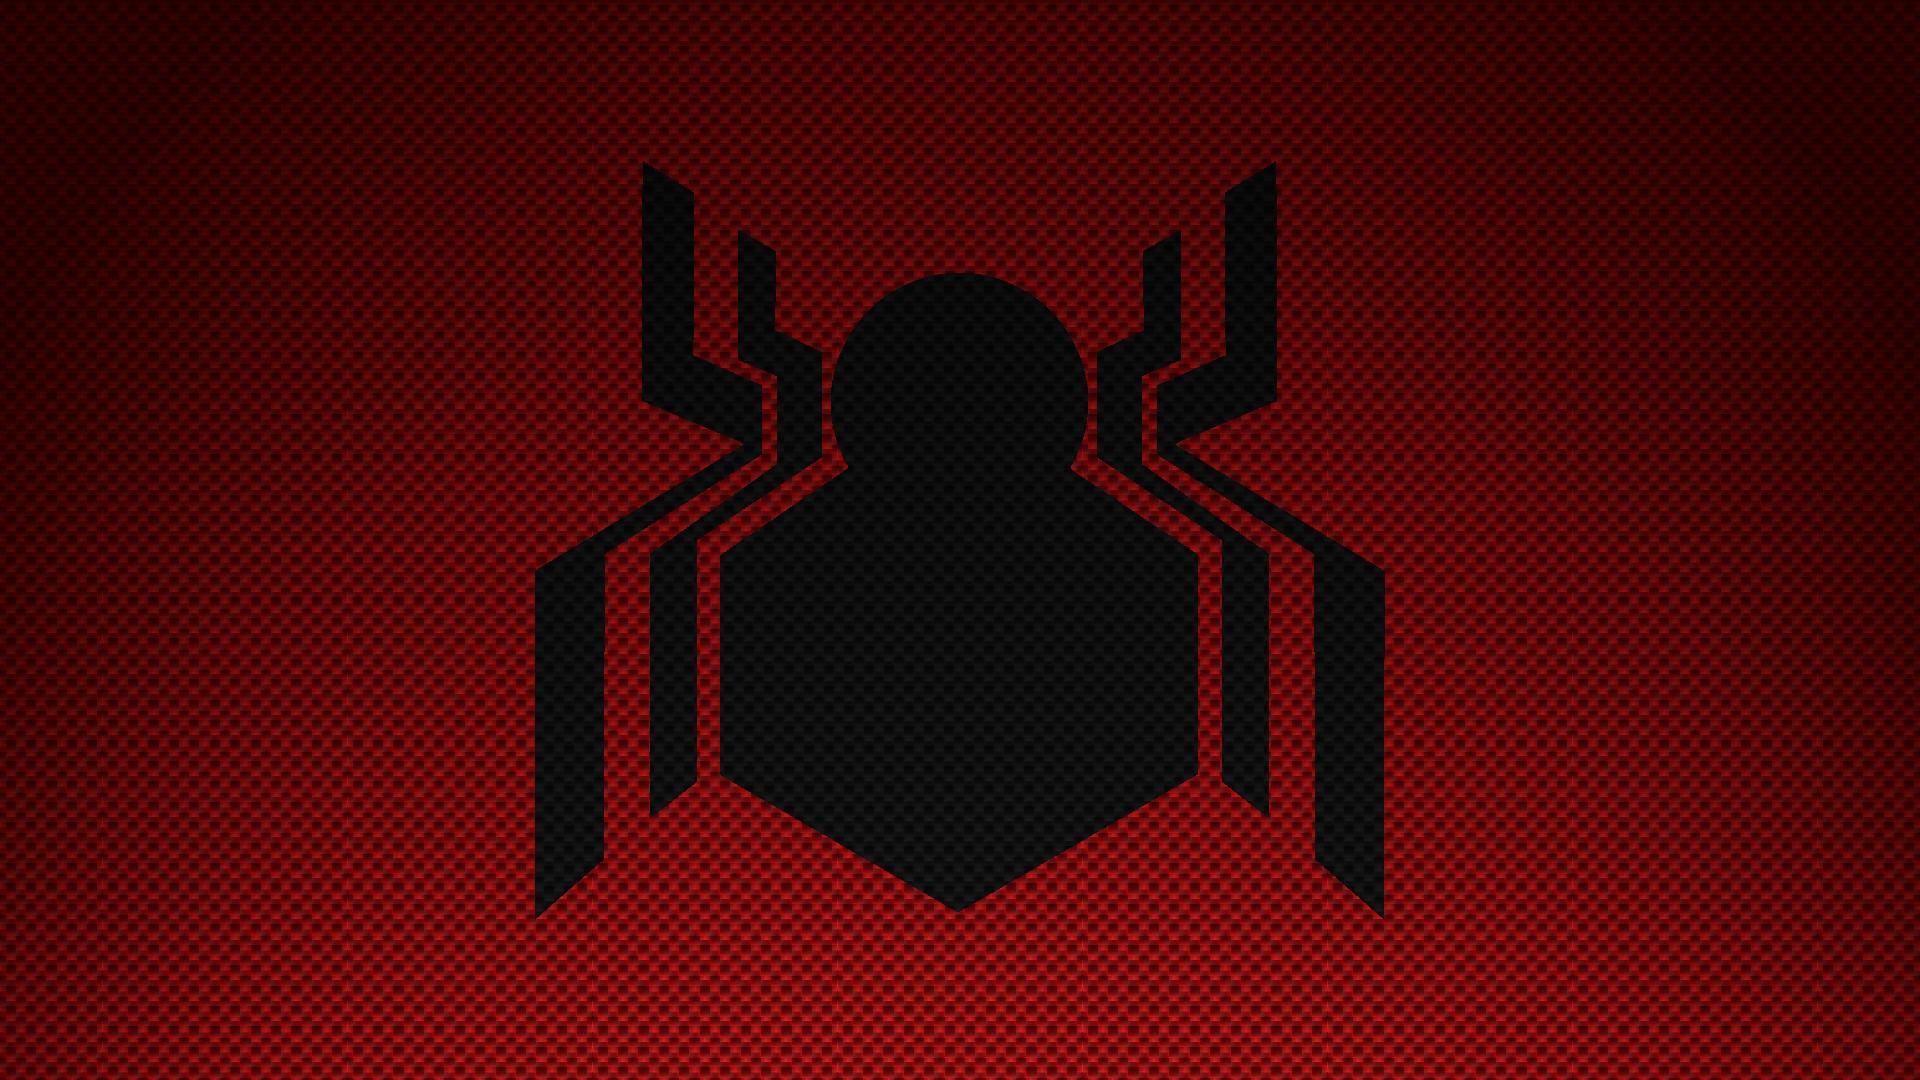 Spider Man Homecoming Wallpapers Hd Spiderman Homecoming